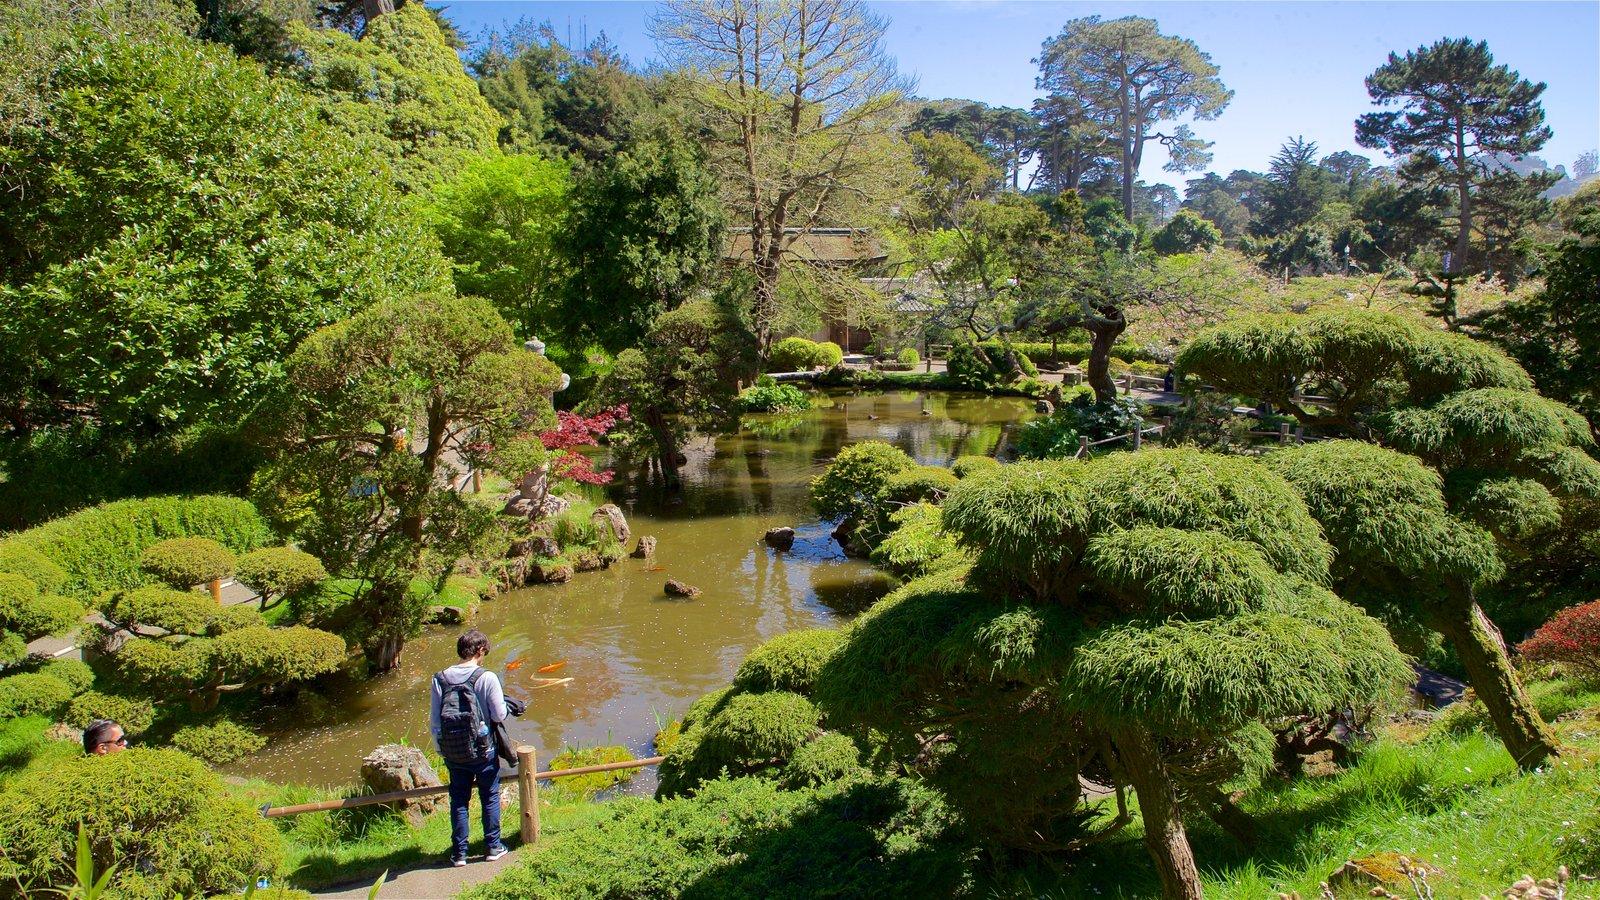 Japanese Tea Garden caracterizando arquitetura de patrimônio, um lago e um jardim